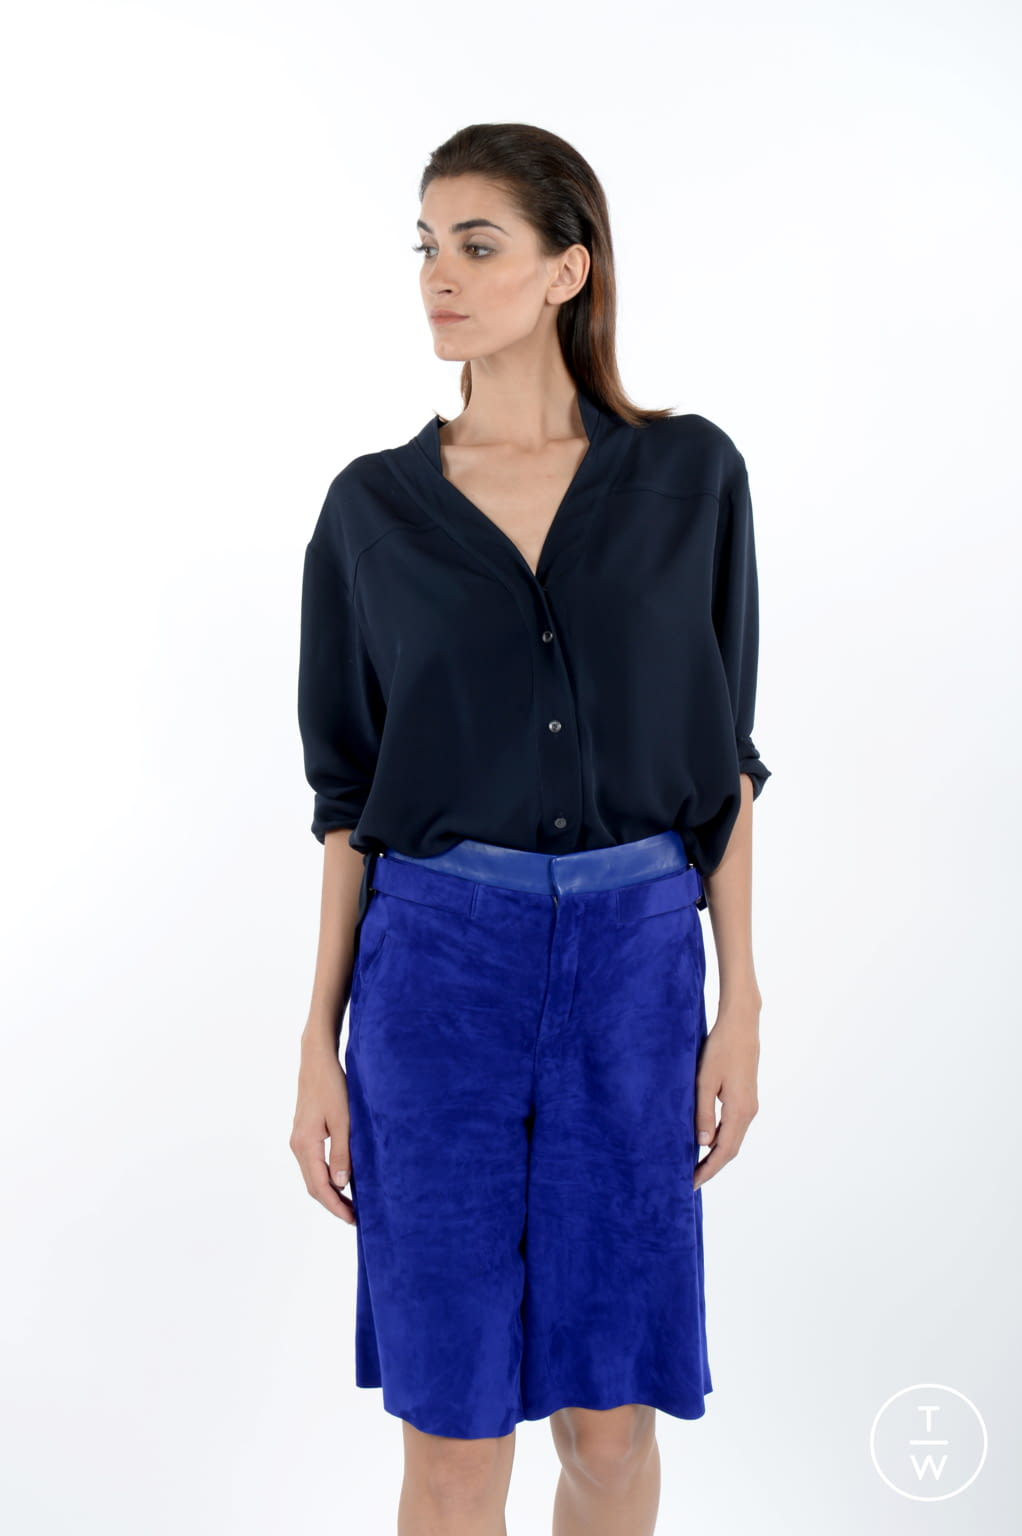 Fashion Week Paris Spring/Summer 2017 look 20 de la collection Maison Ullens womenswear